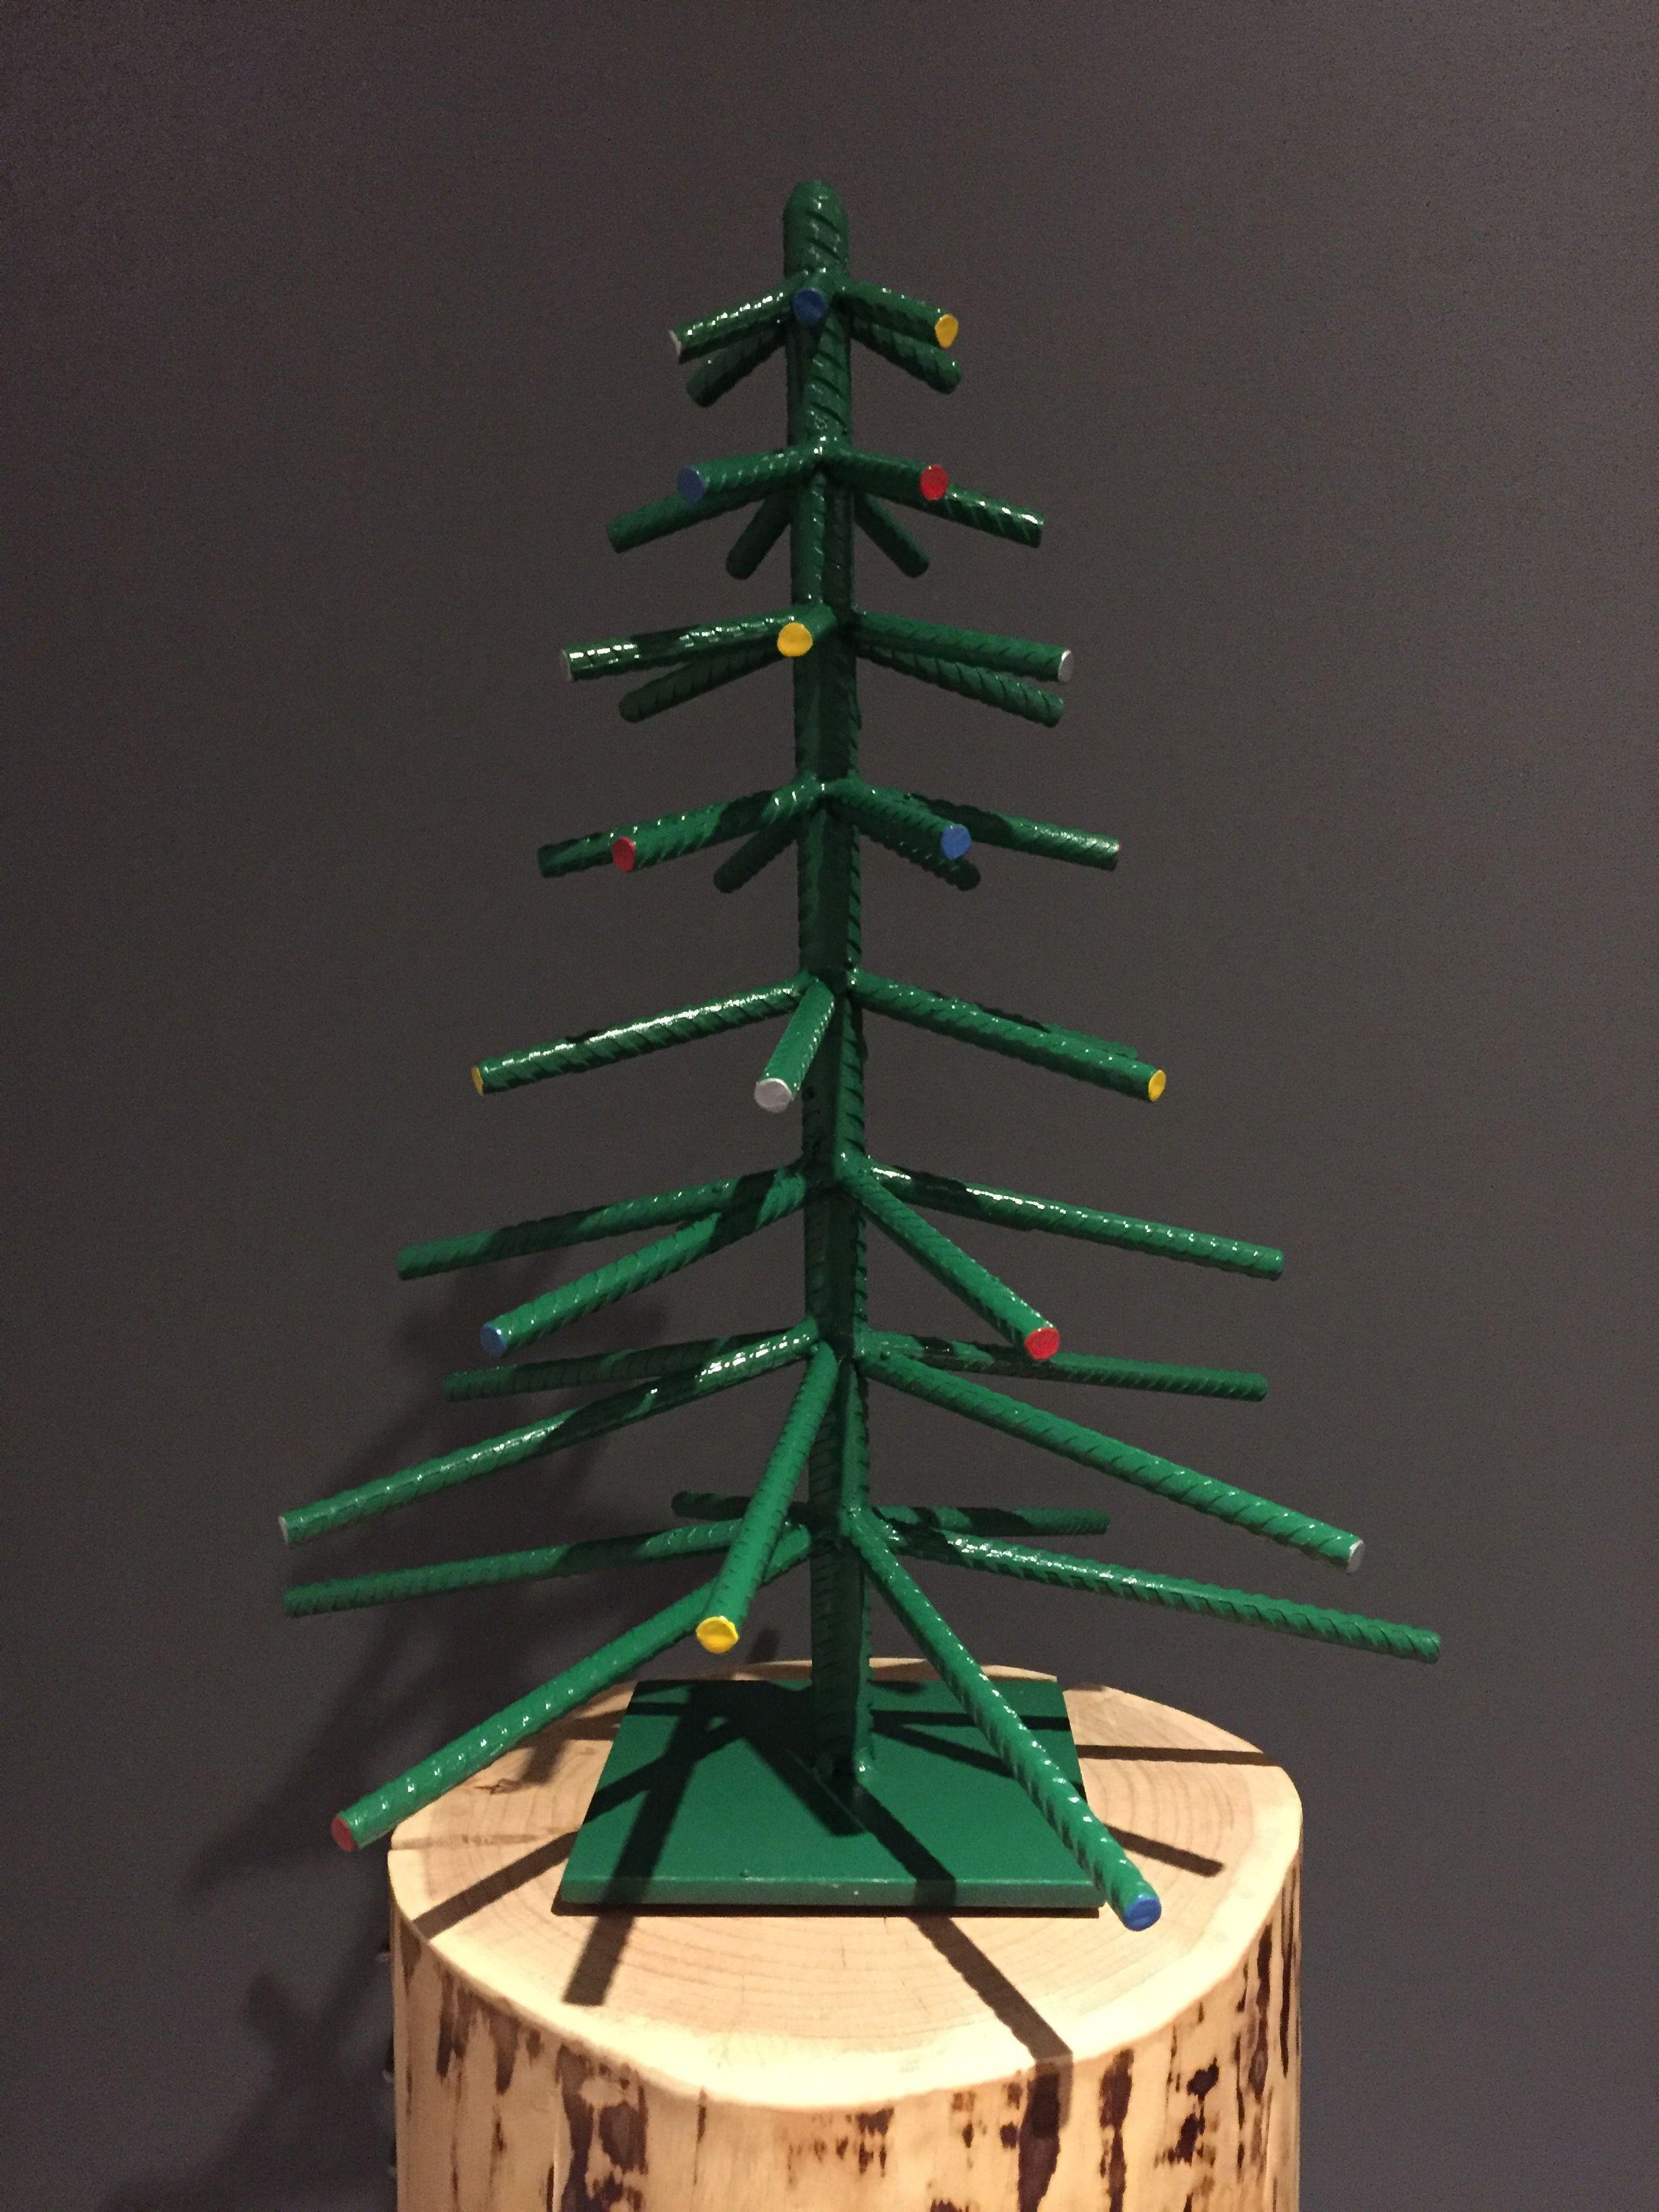 Rebar Green Christmas Tree By Yanick Bluteau Metal Tree Wall Art Metal Tree Art Gallery Wall